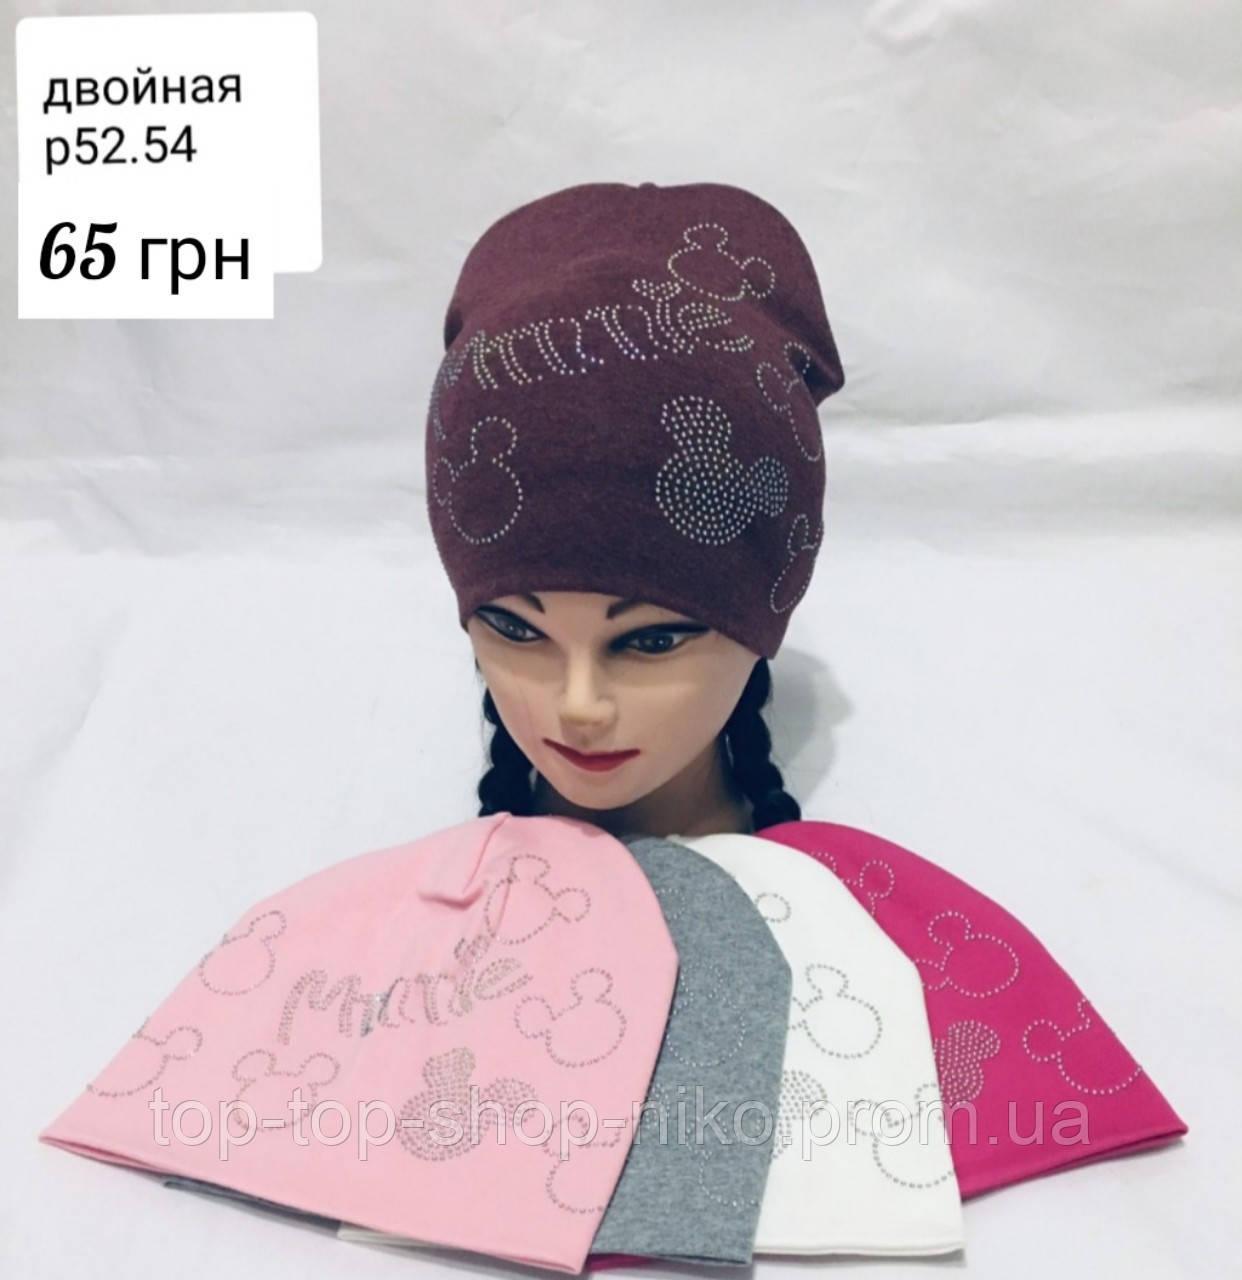 Шапка Ангора Двойная